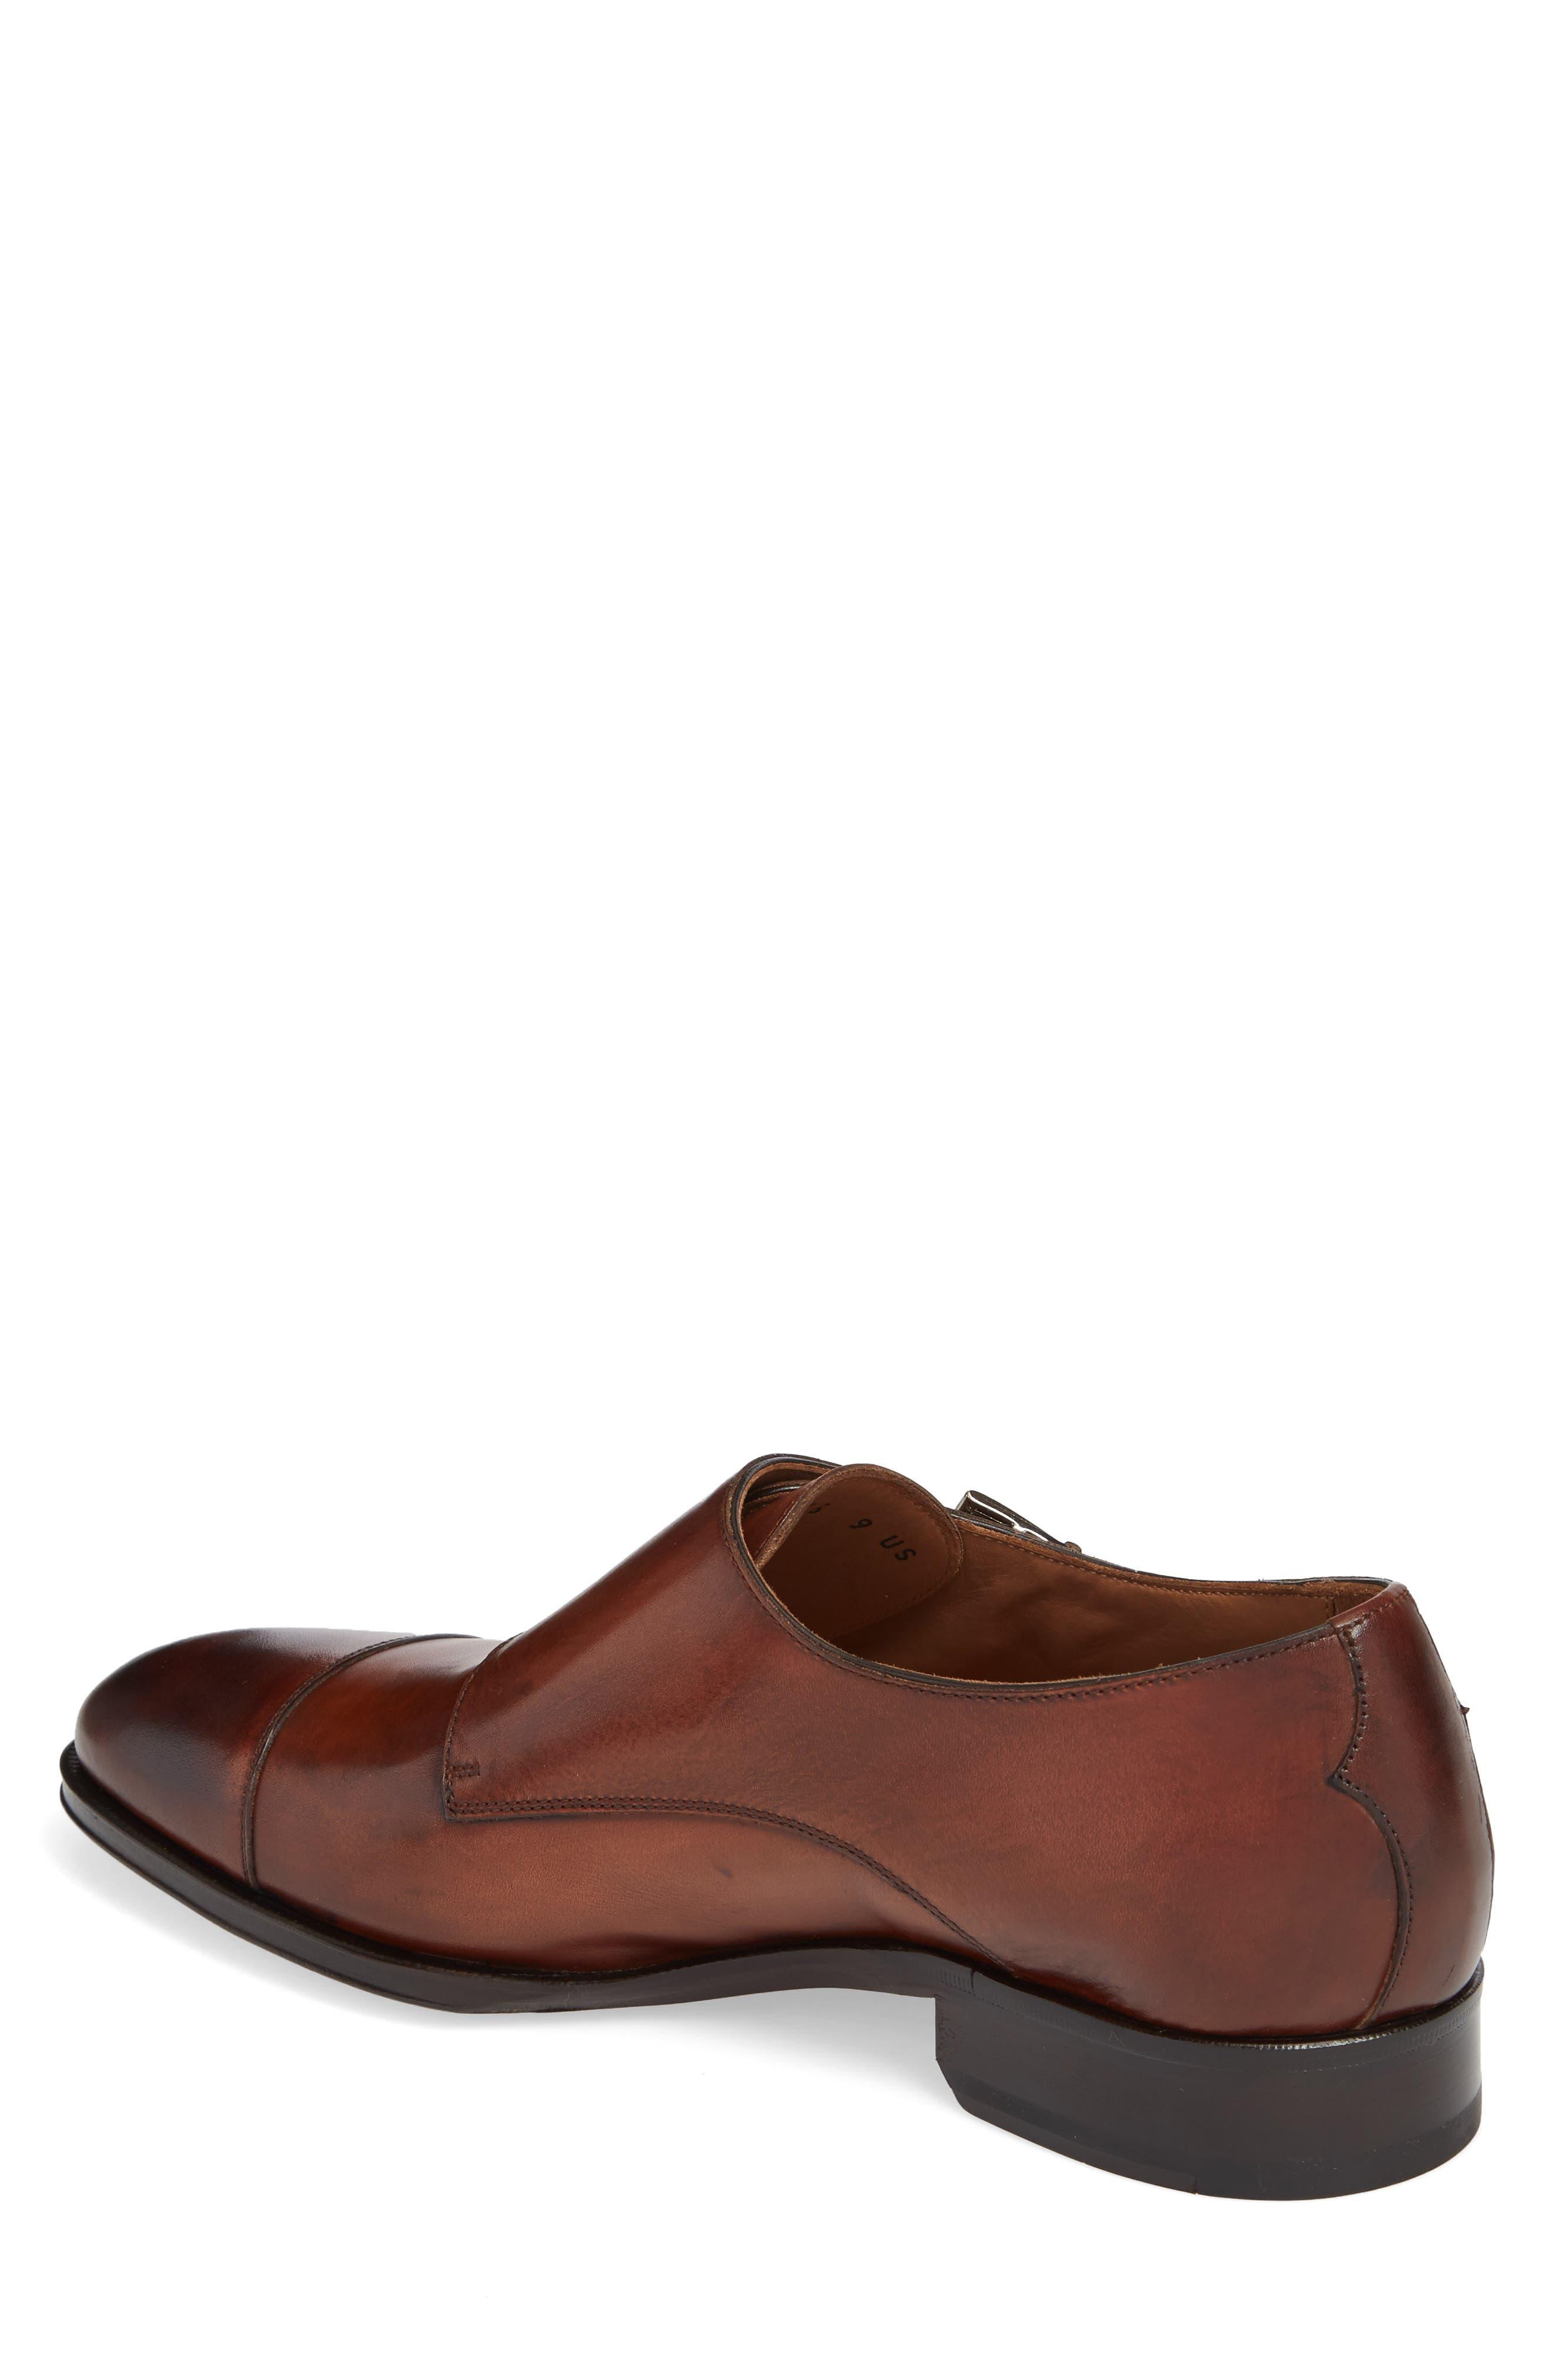 Gallo Bianco Double Monk Strap Shoe,                             Alternate thumbnail 2, color,                             201